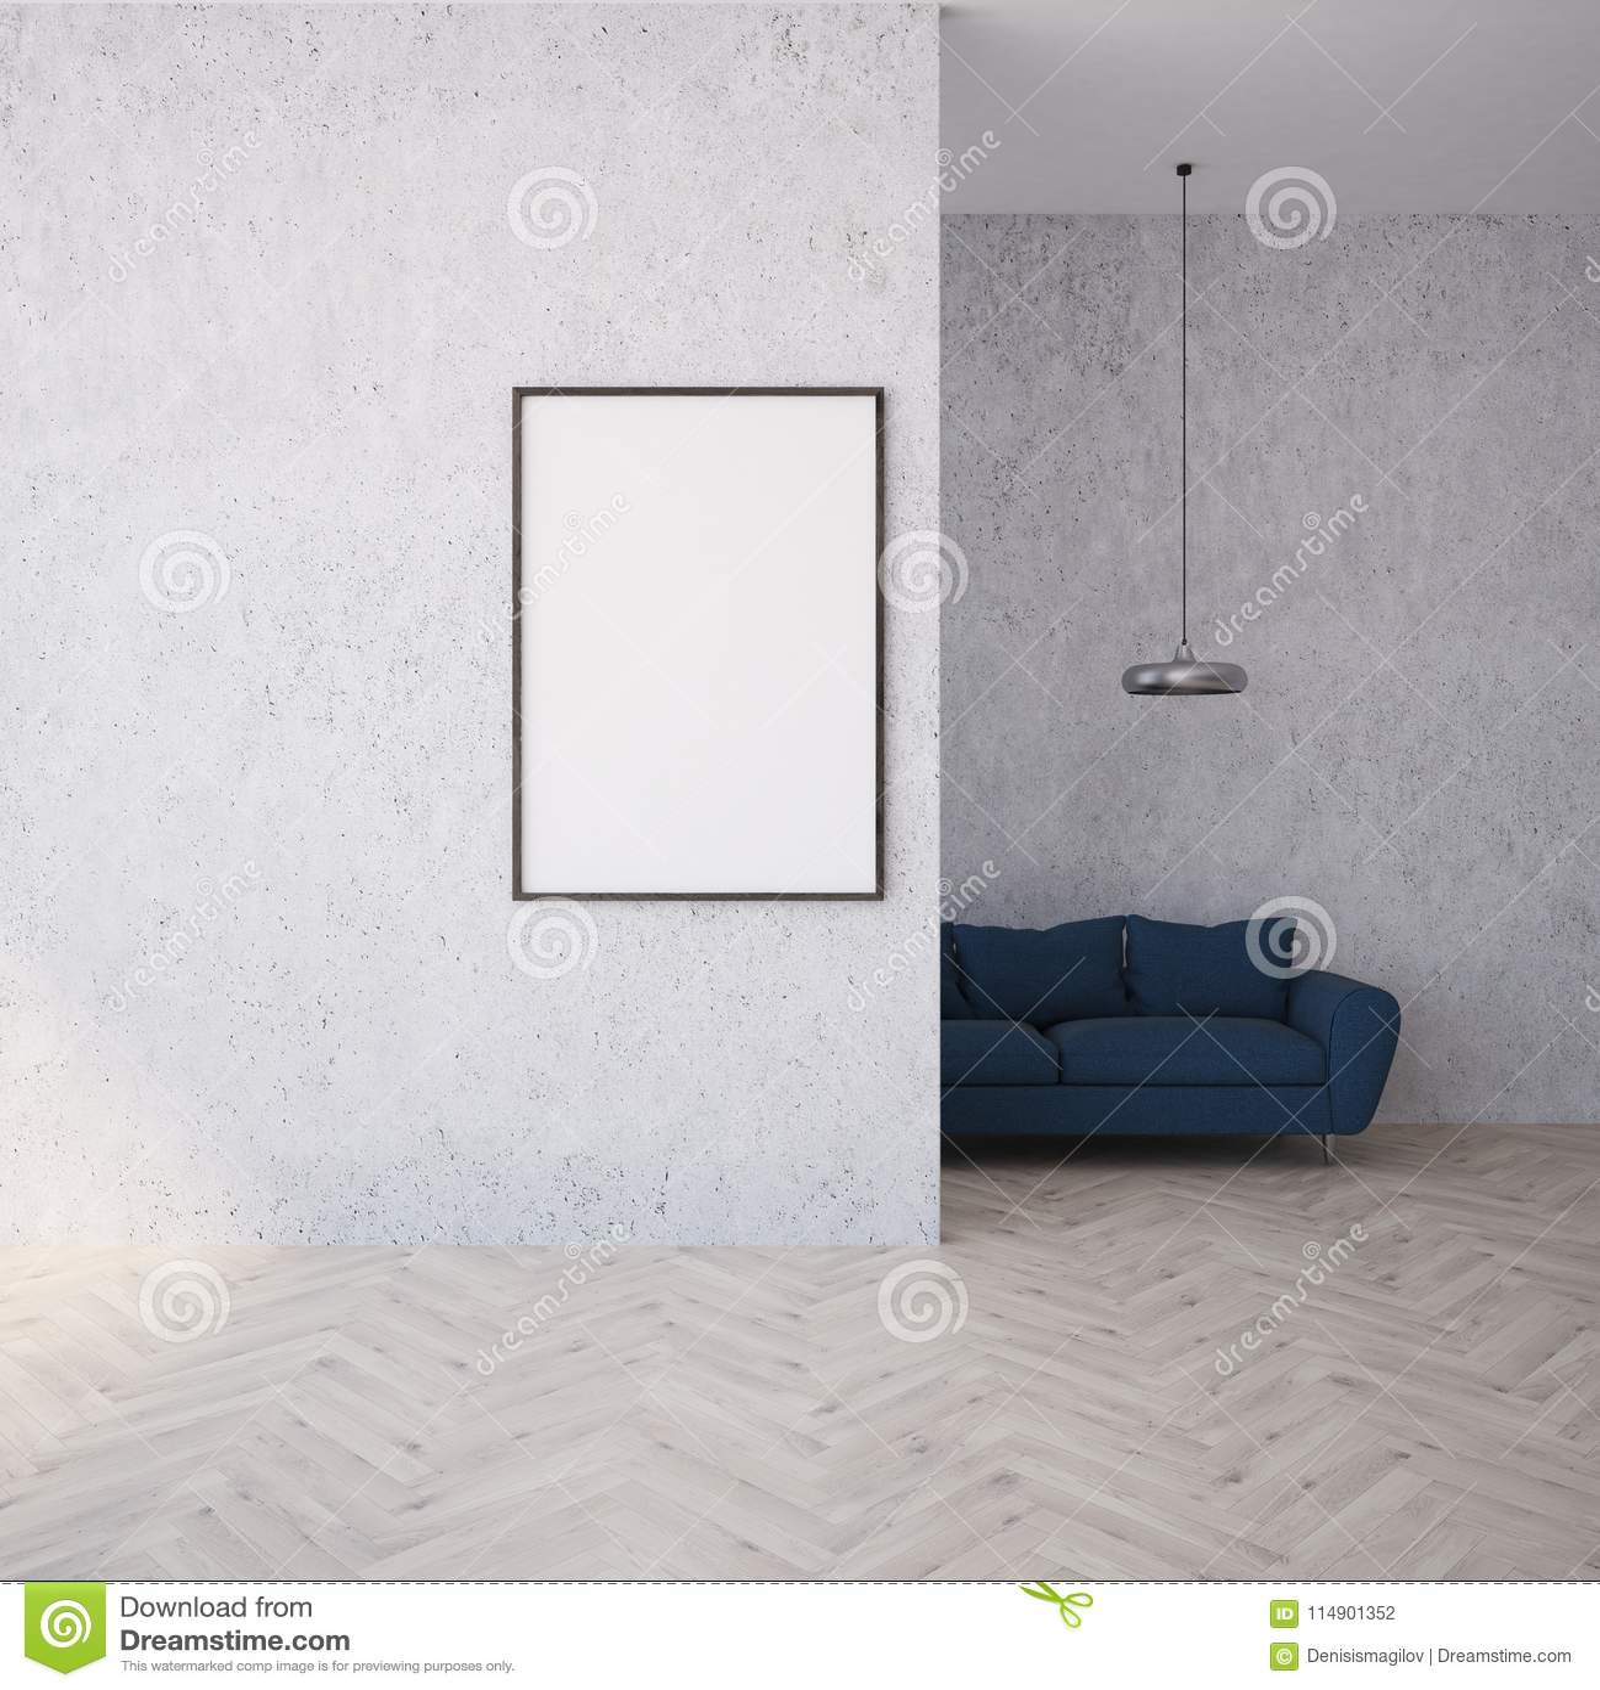 Terrific White Living Room Black Sofa Poster Stock Illustration Beatyapartments Chair Design Images Beatyapartmentscom